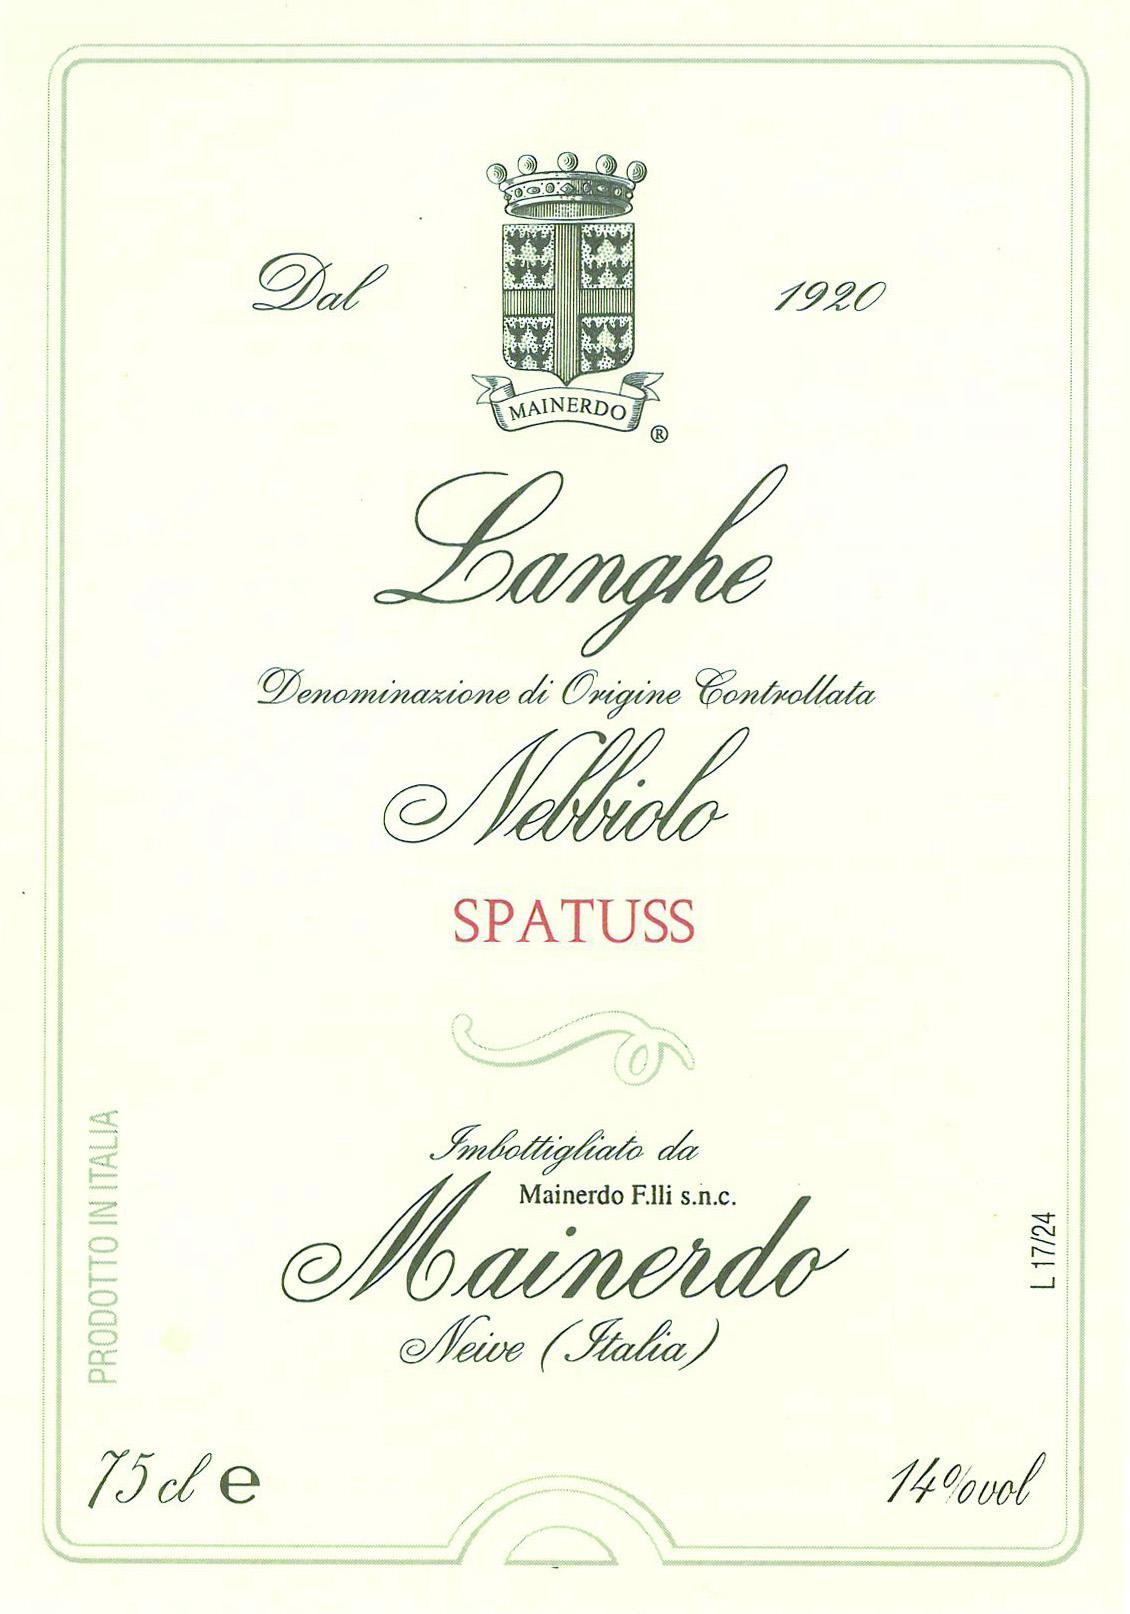 Langhe Nebbiolo Spatuss